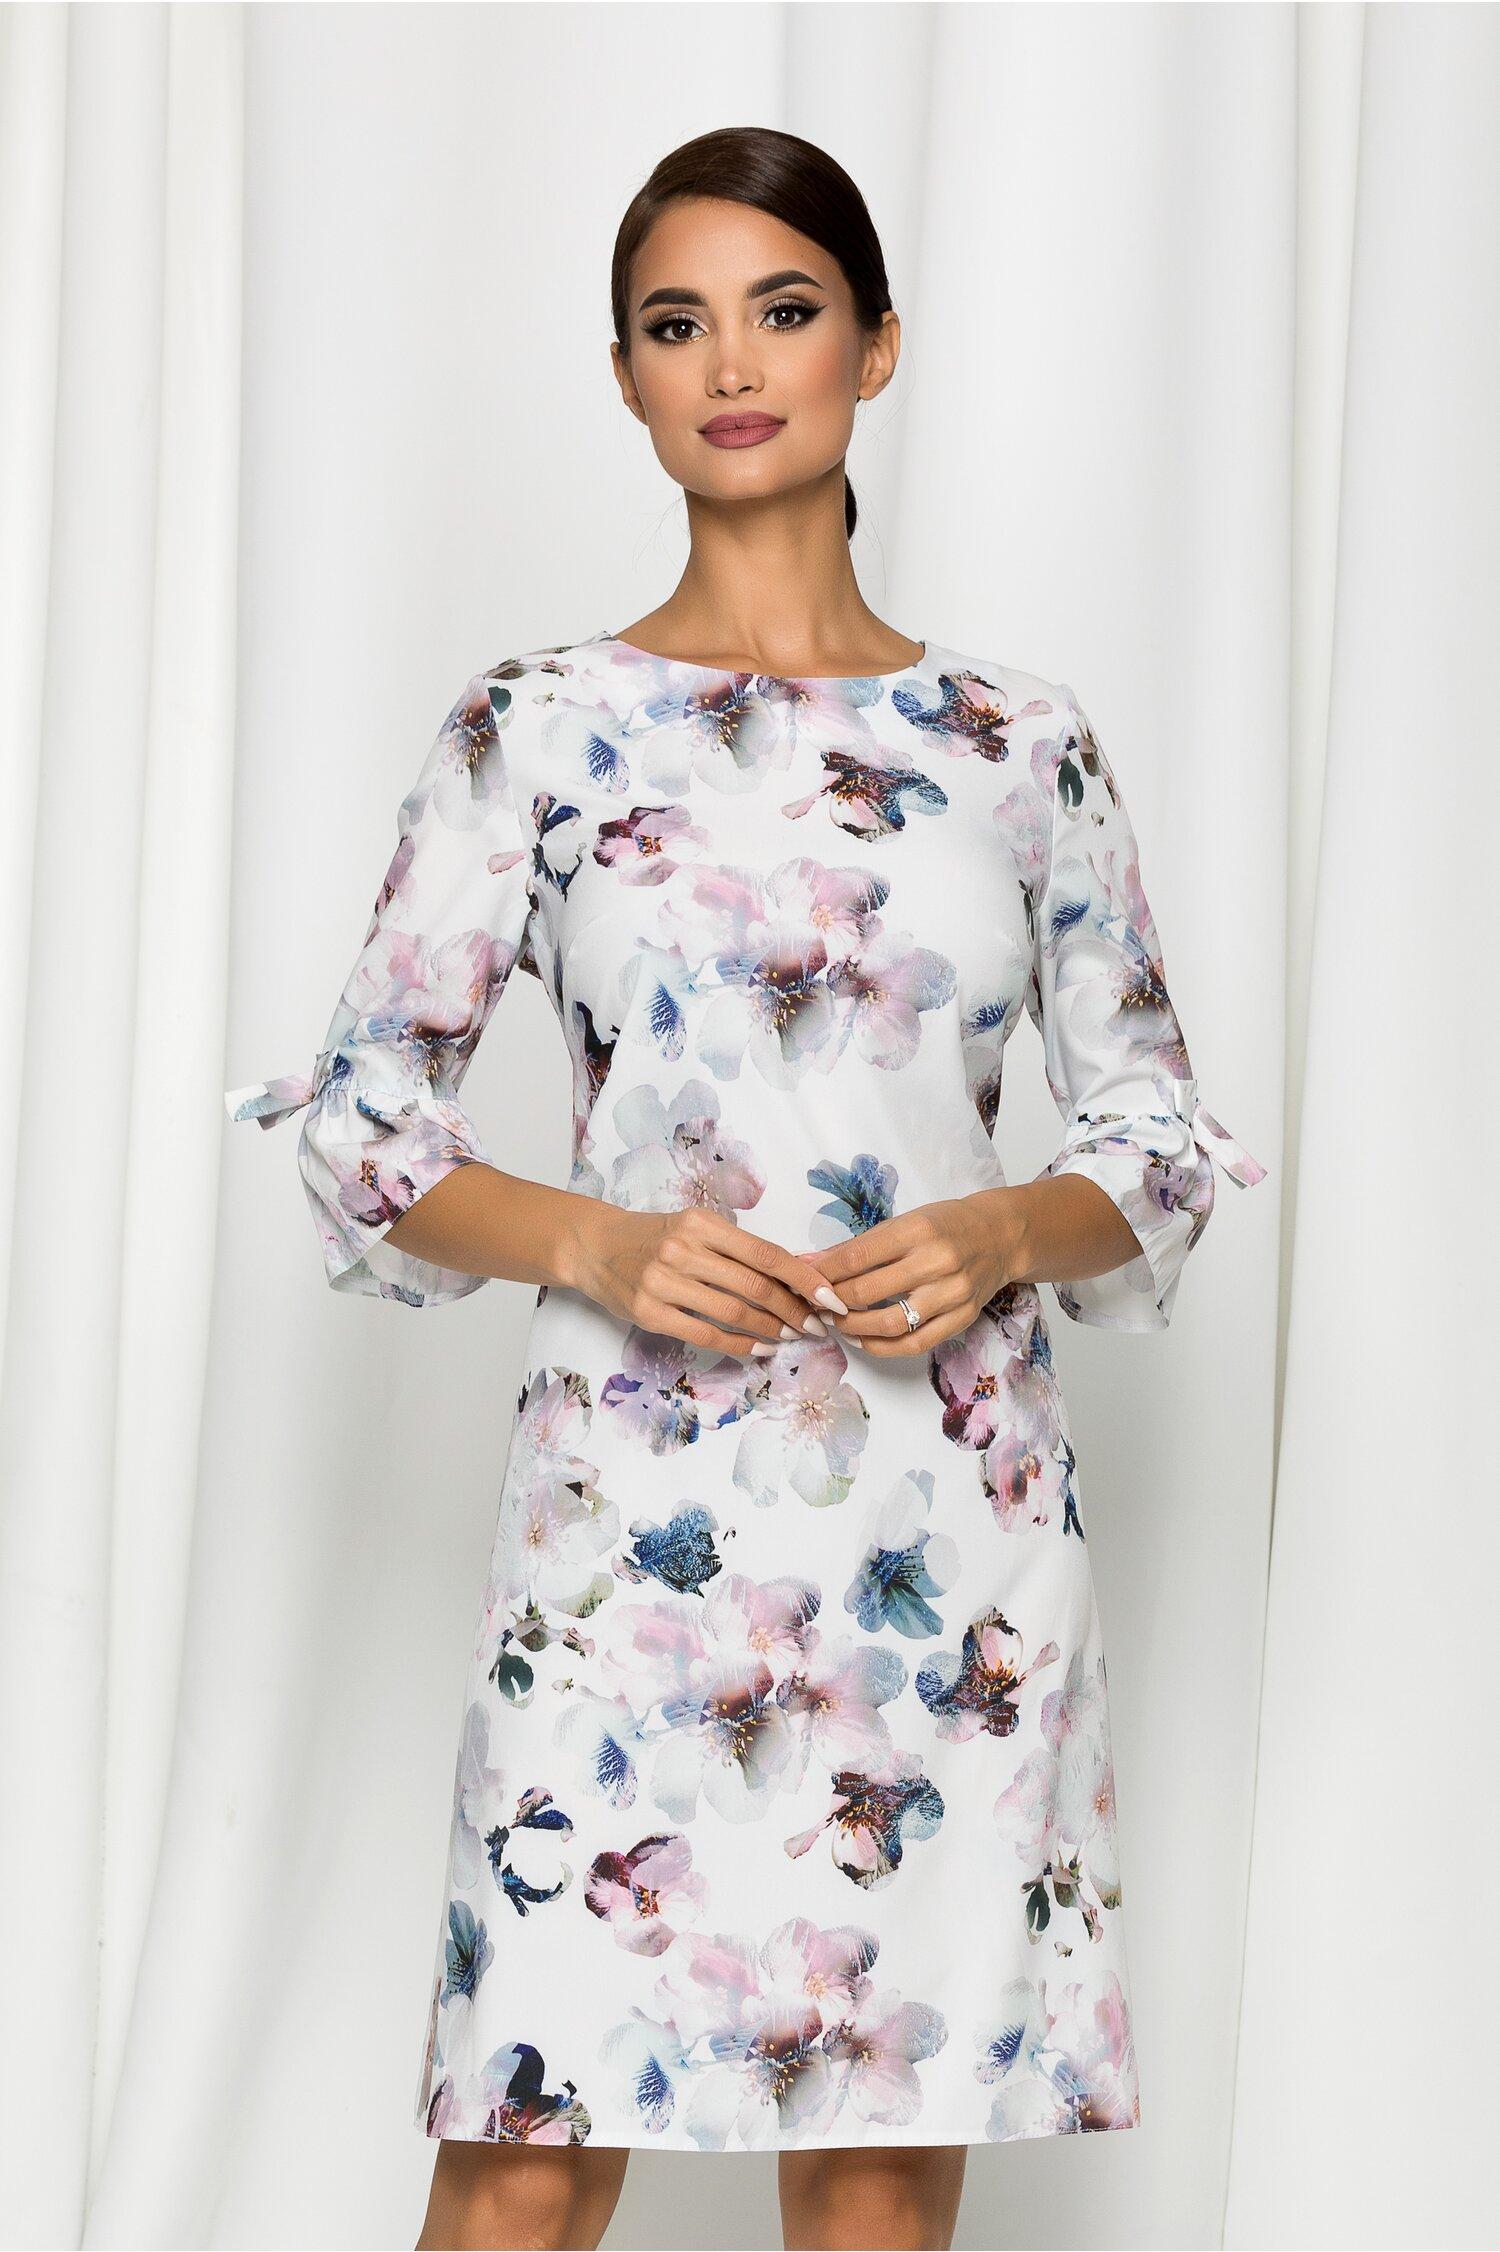 Rochie Mihaela alba cu imprimeu floral si maneci tip clopot